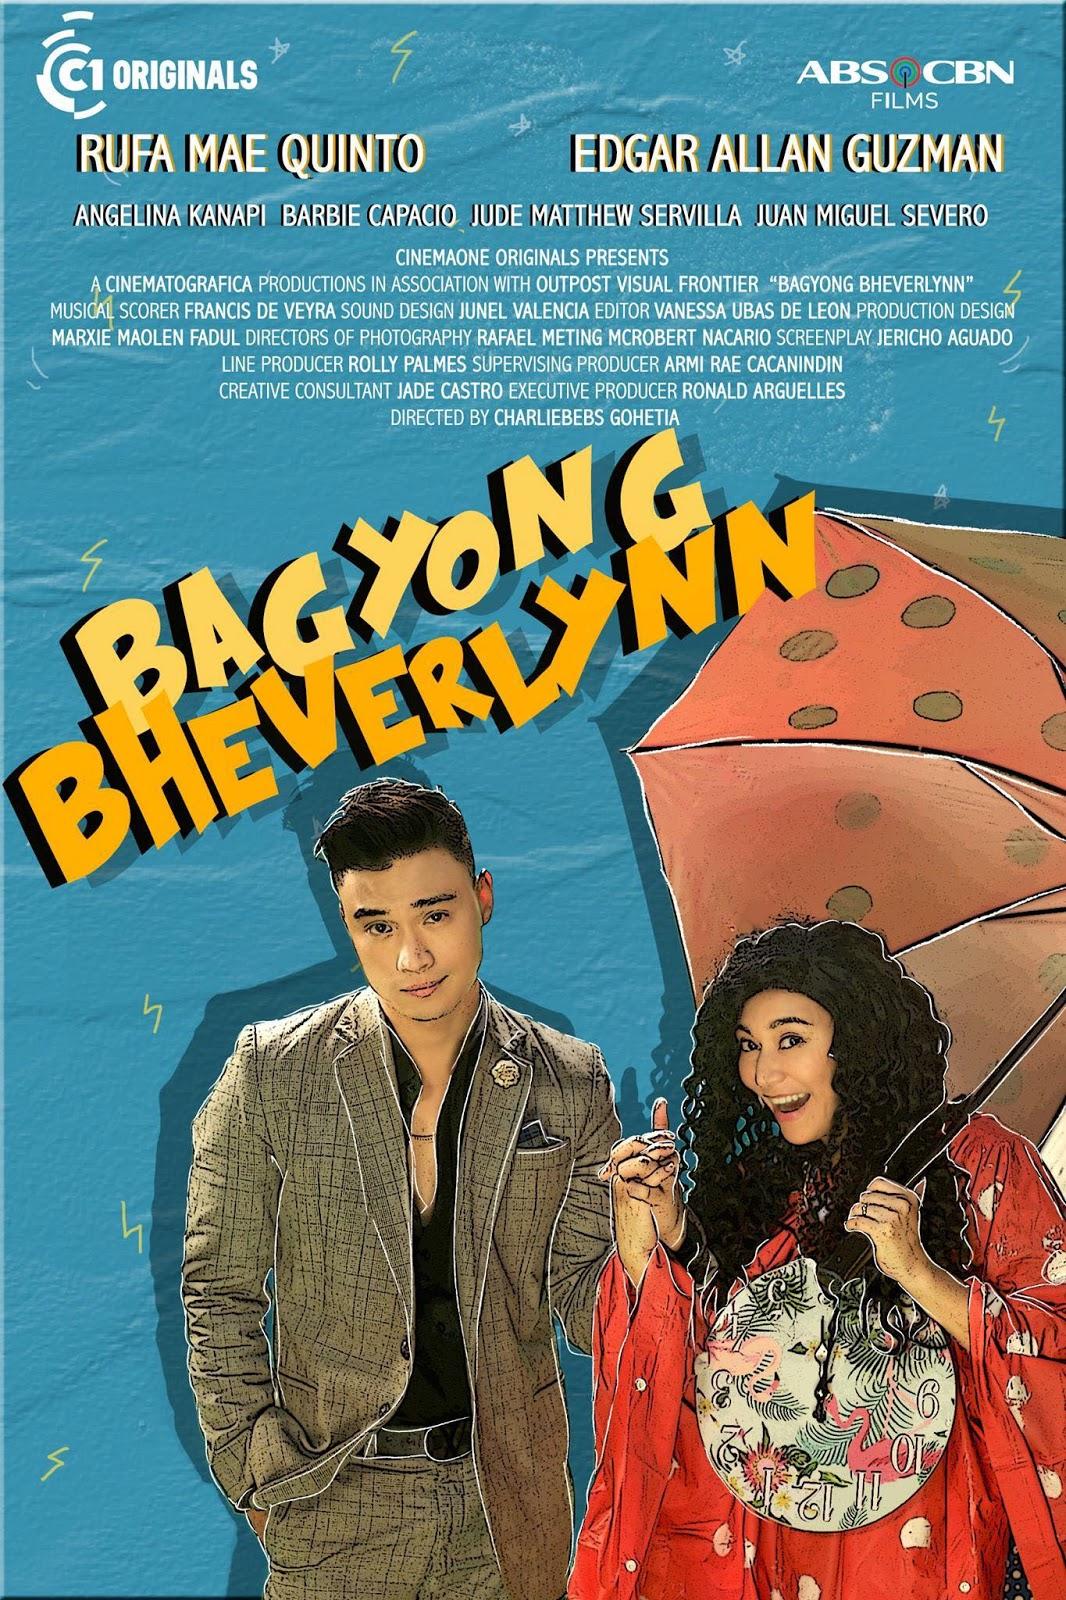 new styles 2ac6f 86442 Cinema One Originals 2018   Bagyong Bheverlynn